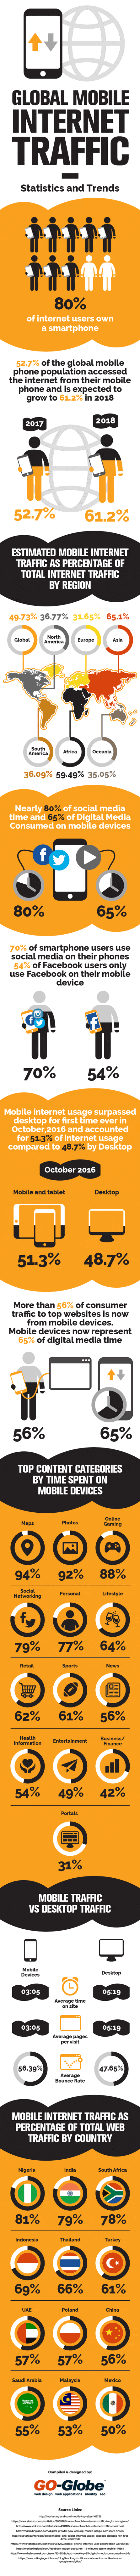 Global mobile internet traffic